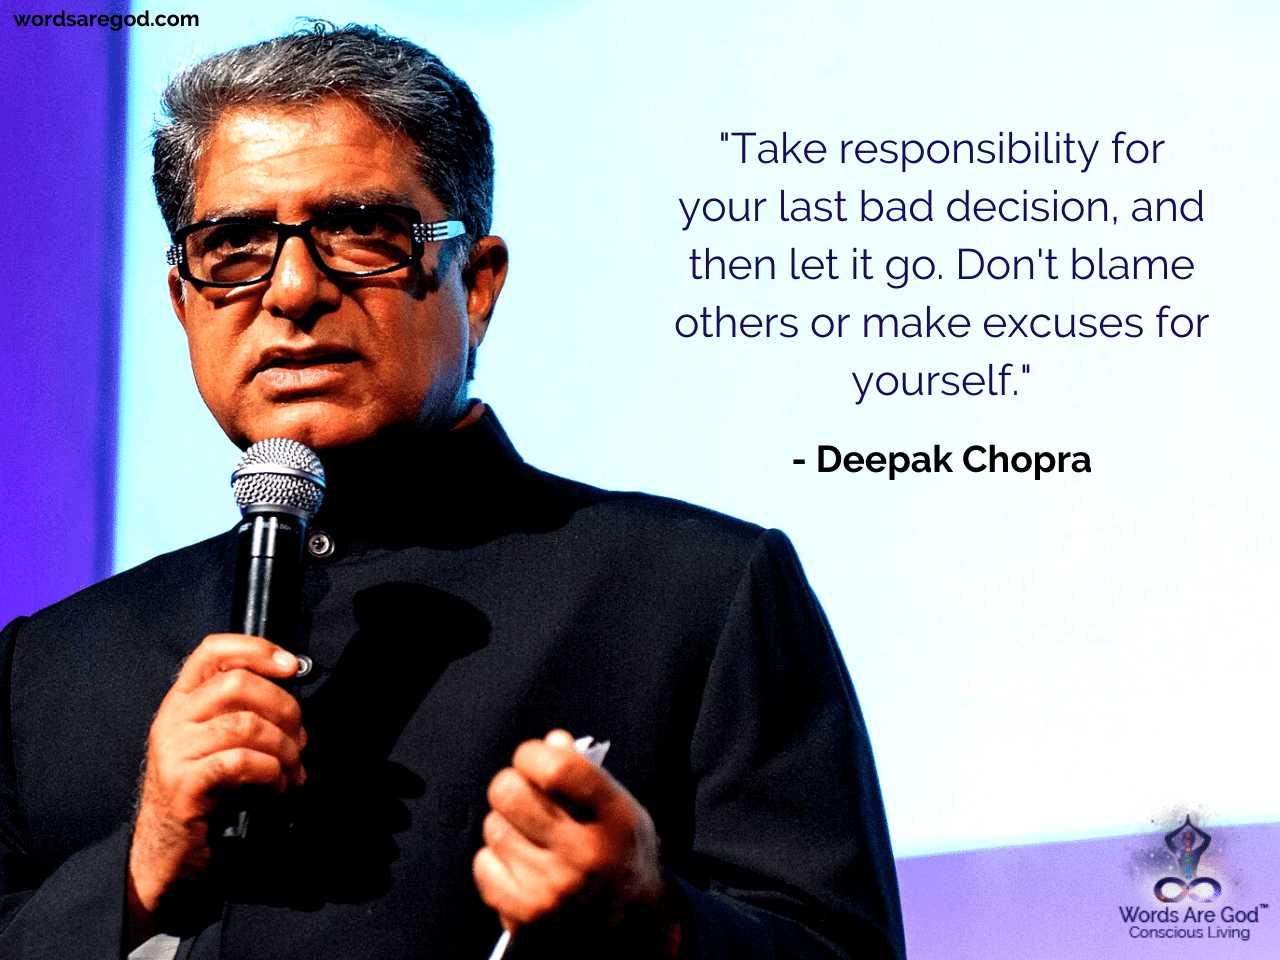 Deepak Chopra Motivational Quote